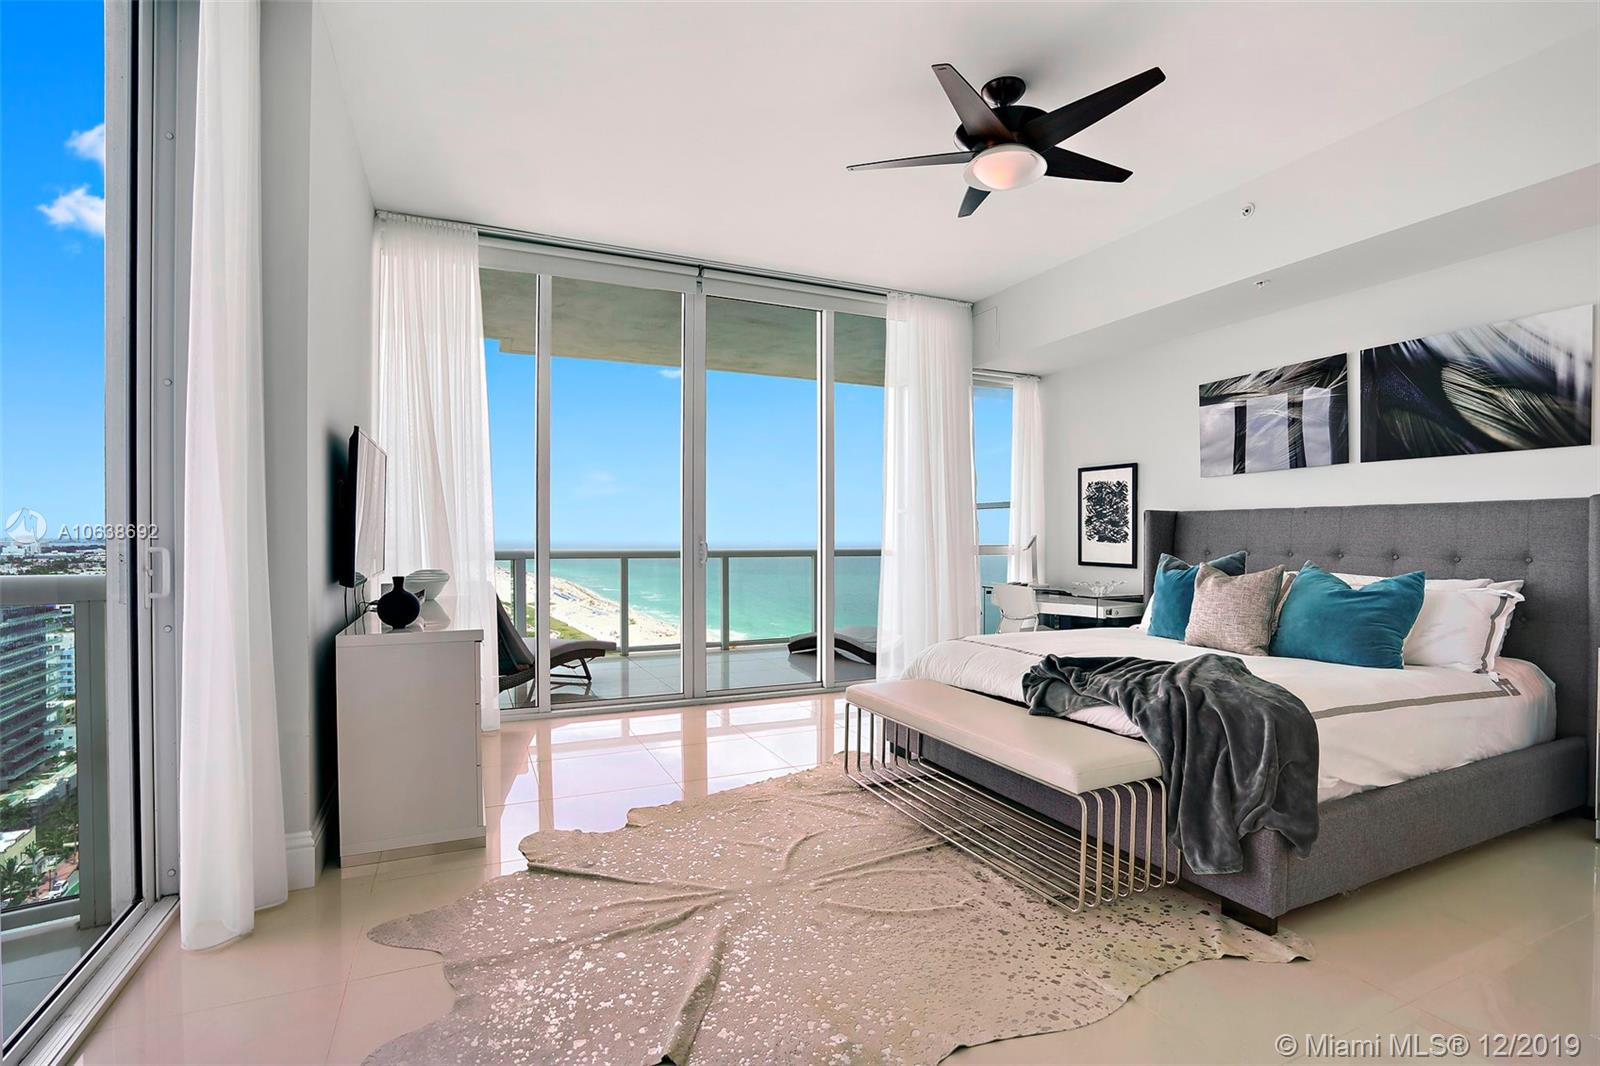 50 S Pointe Dr Miami Beach, FL 33139